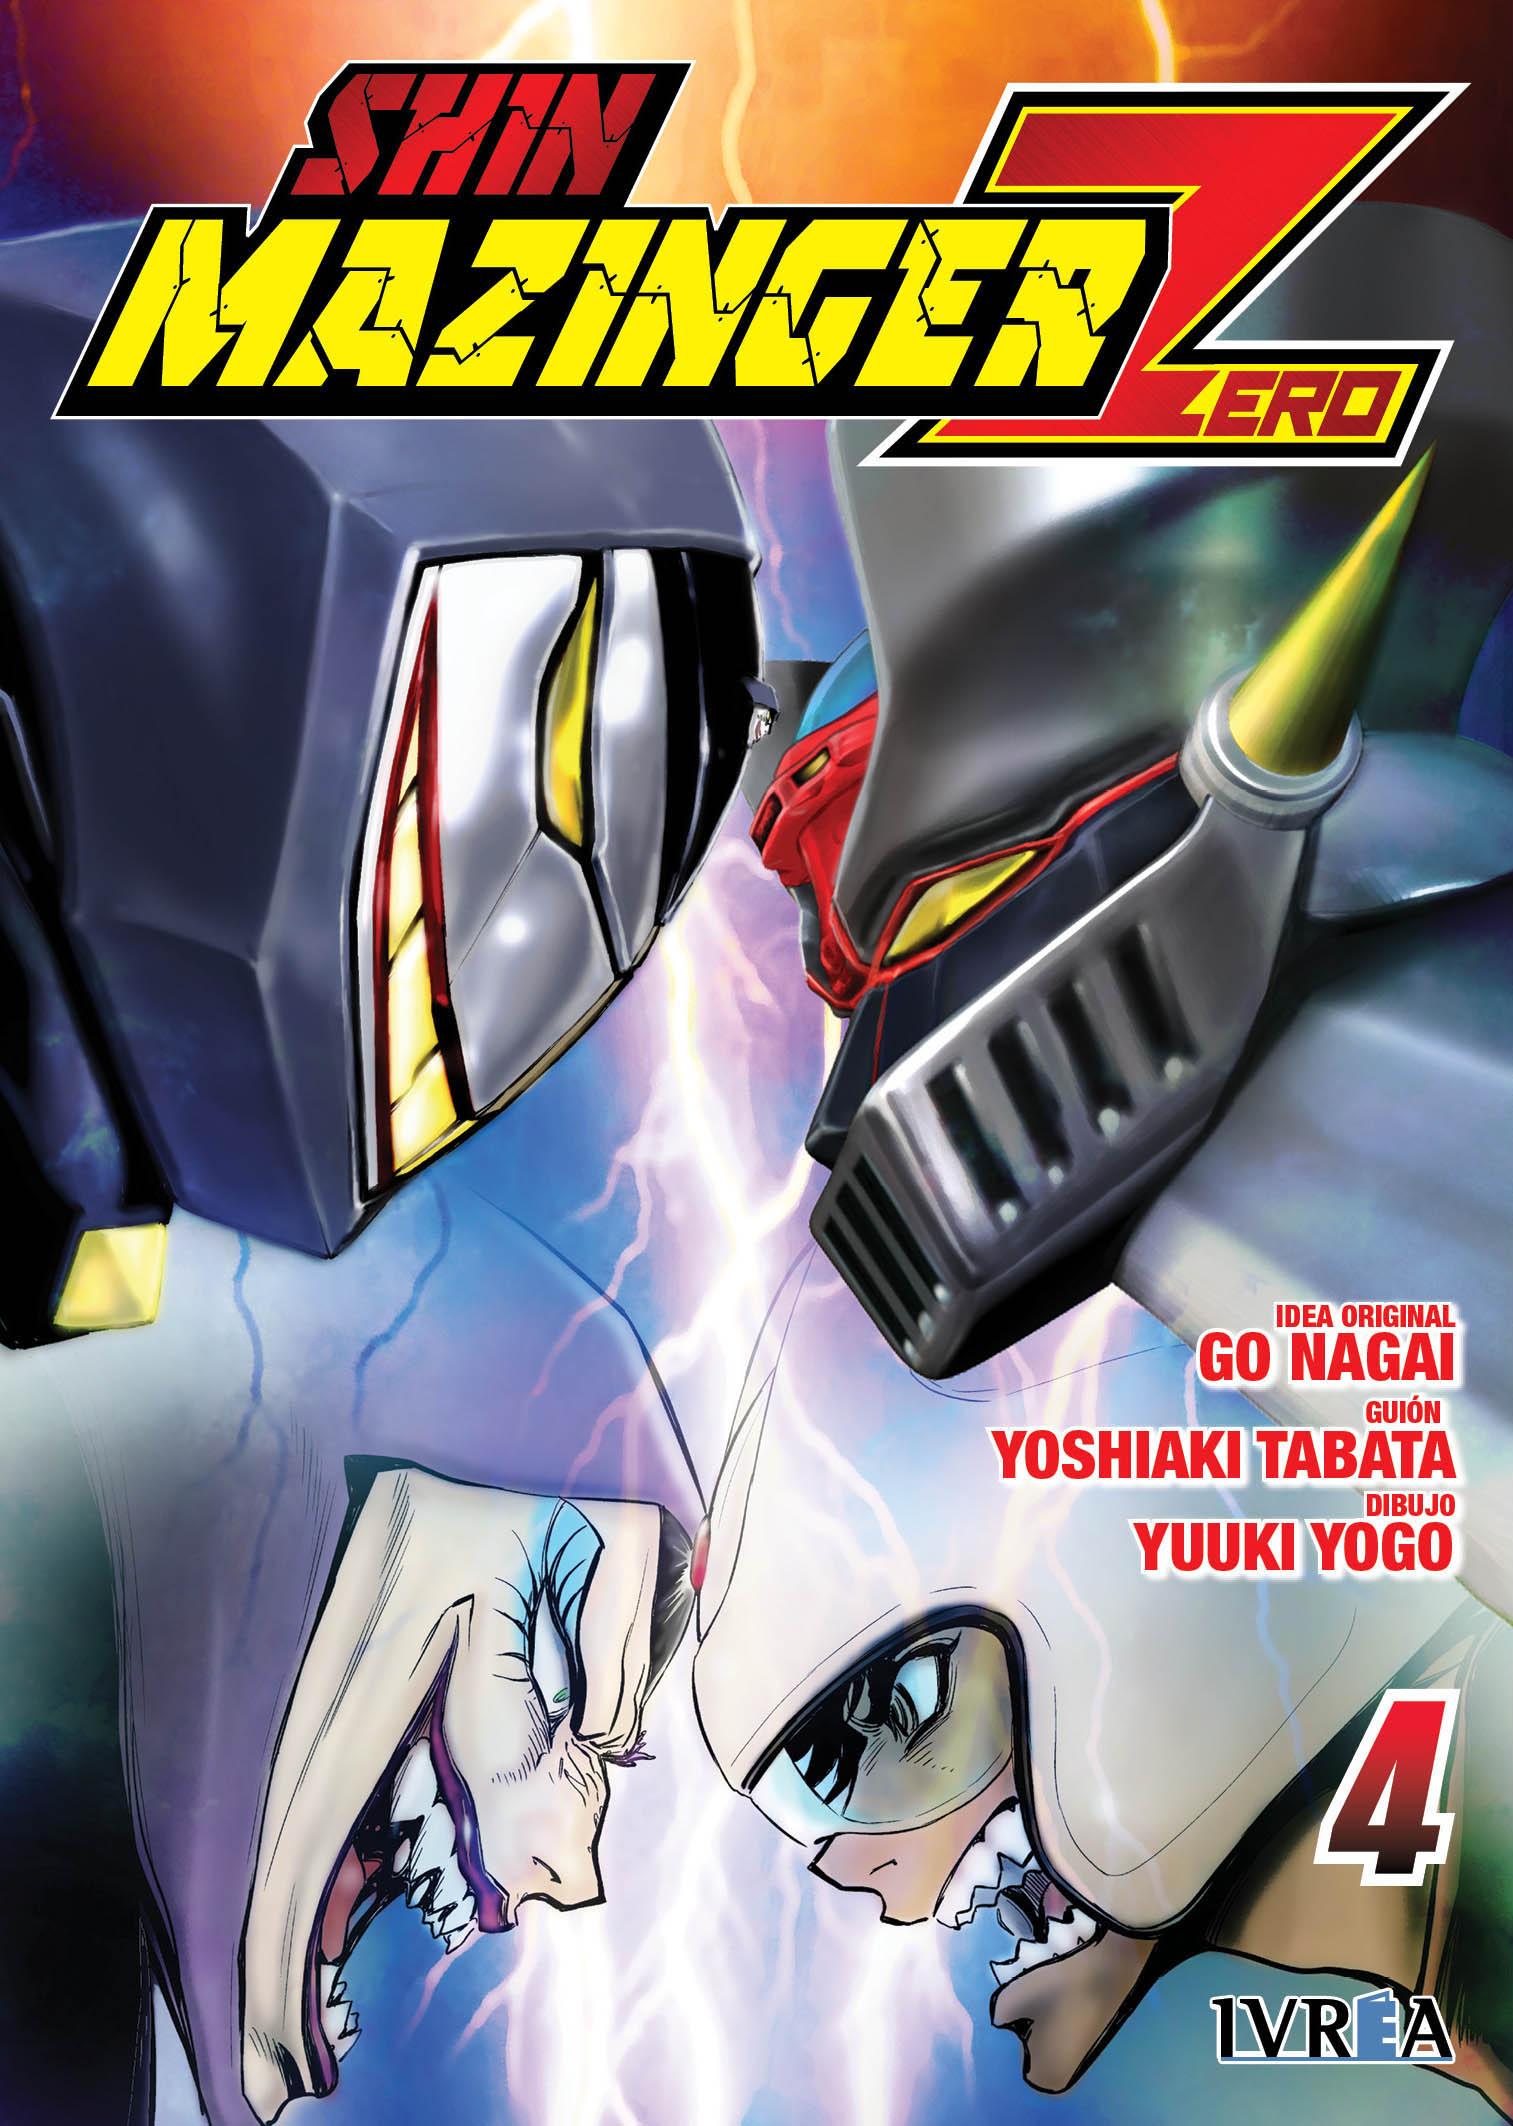 SHIN MAZINGER ZERO 04